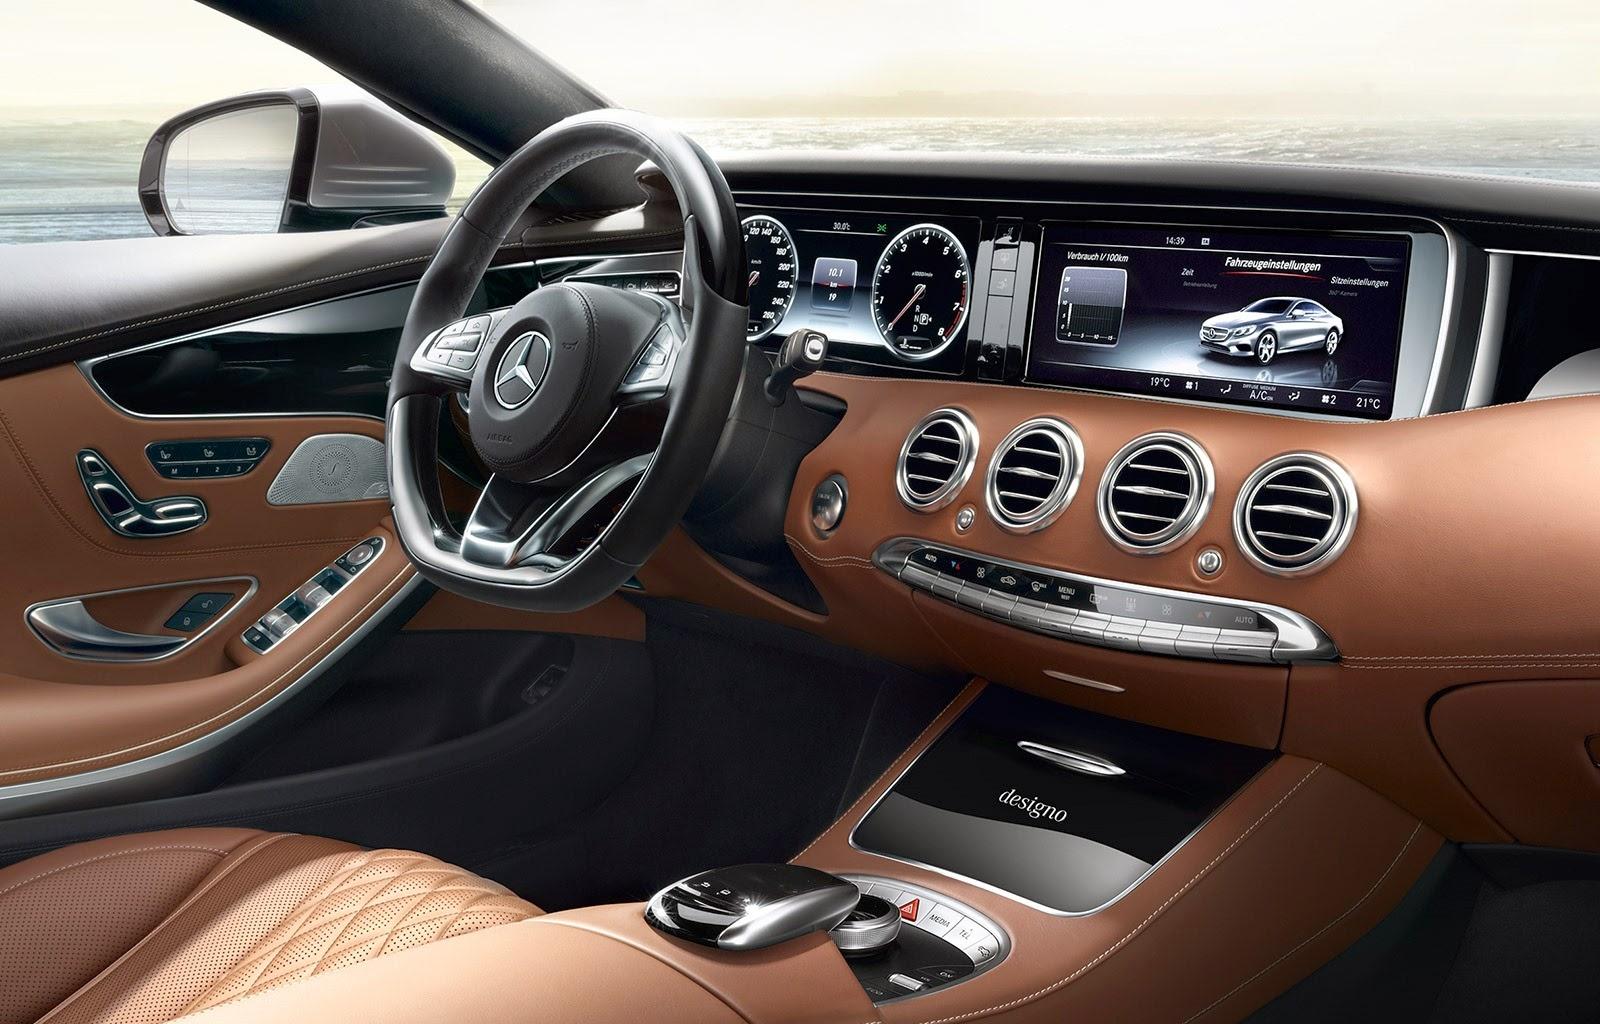 2016 ford mustang interior u s news amp world report - 2015 Mercedesbenz Sclass Us News Amp World Report